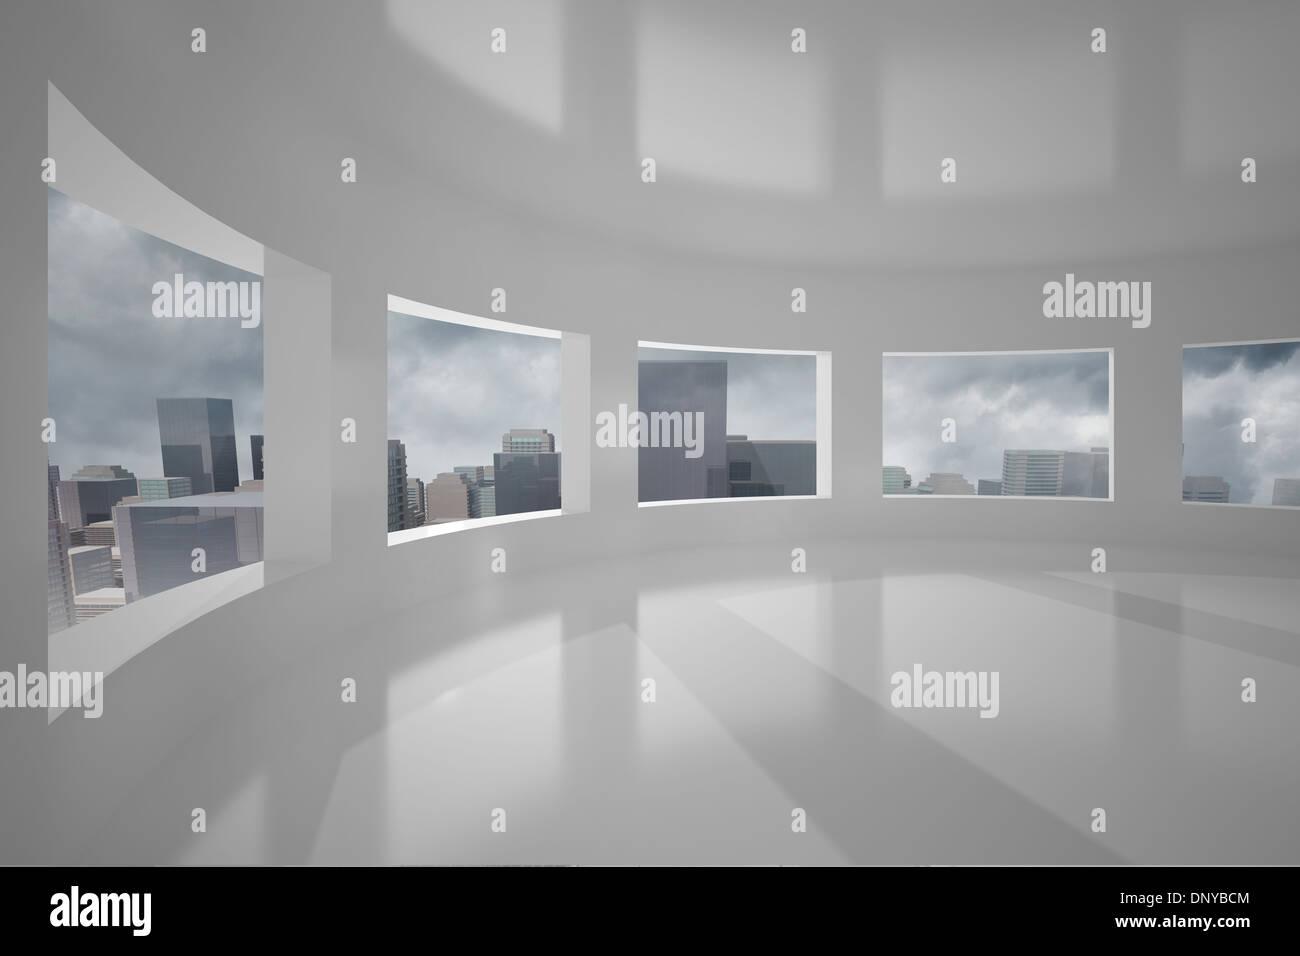 Cityscape seen through windows - Stock Image